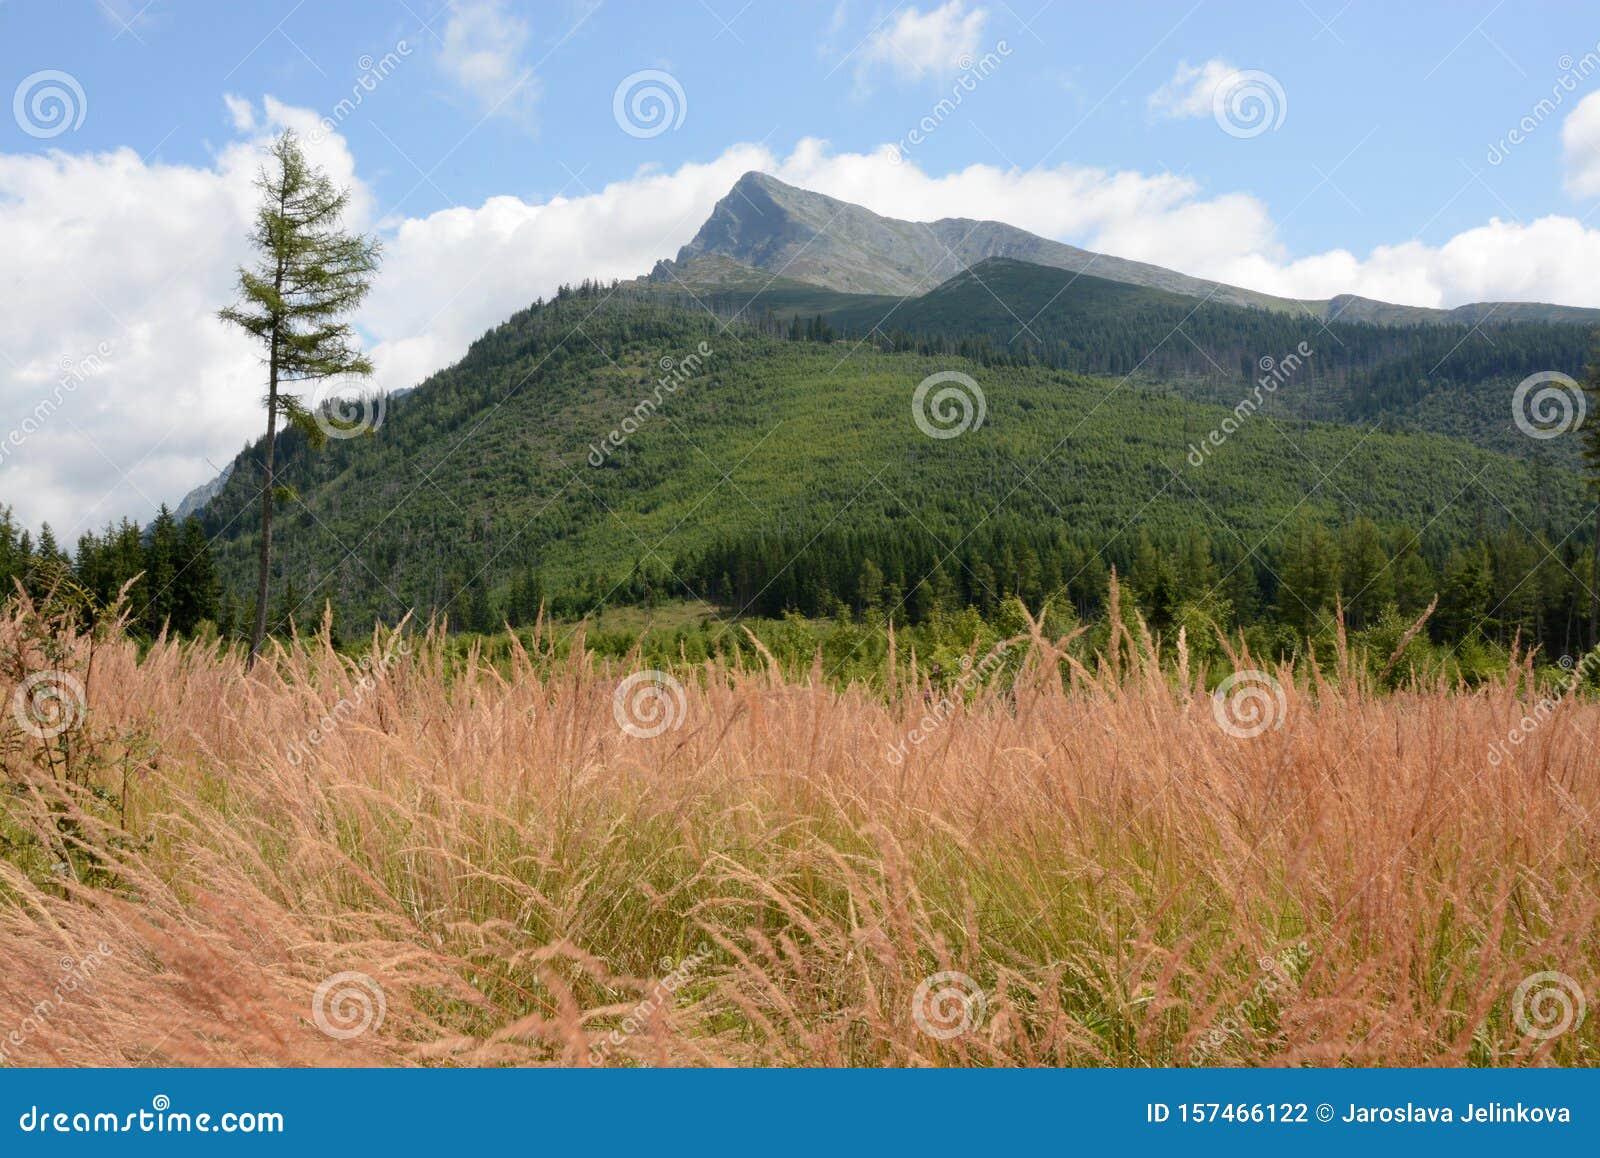 Slovensko, High Tatras, Krivan peak